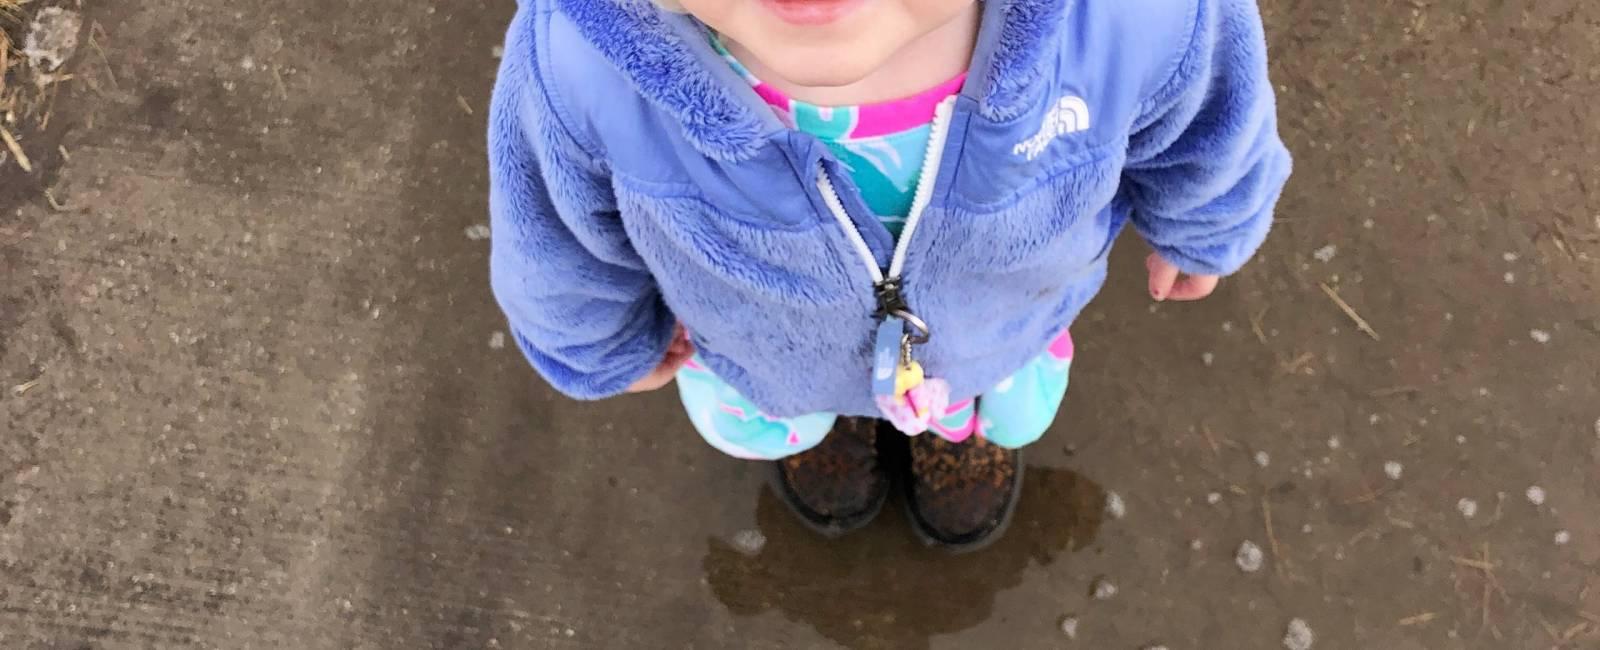 How Do You Raise a Grateful Kid?